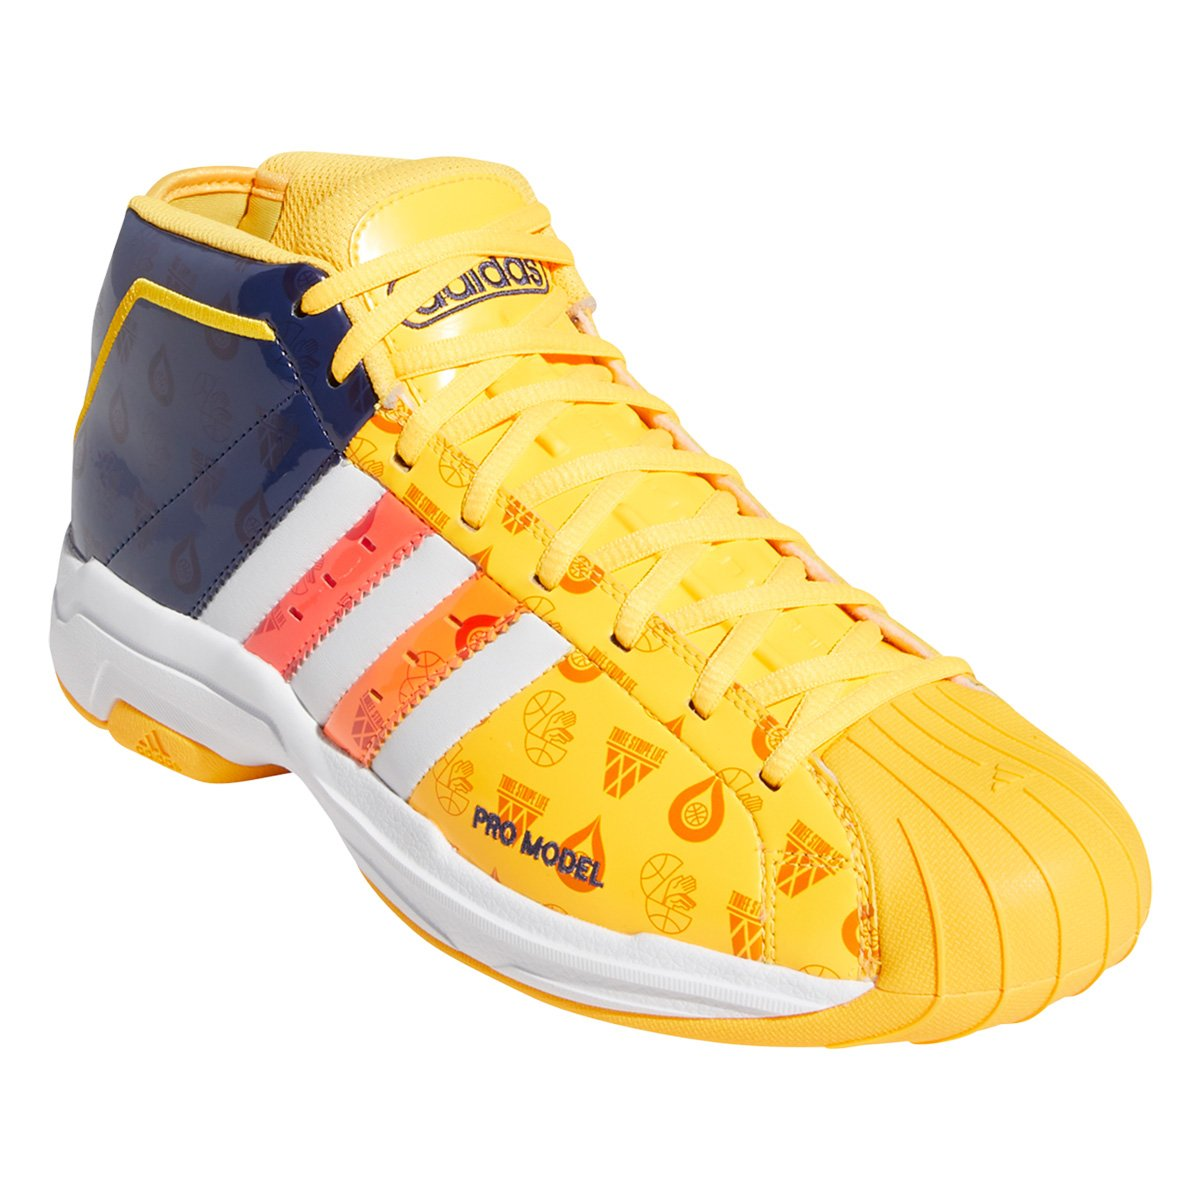 Tênis Adidas Pro Model 2G